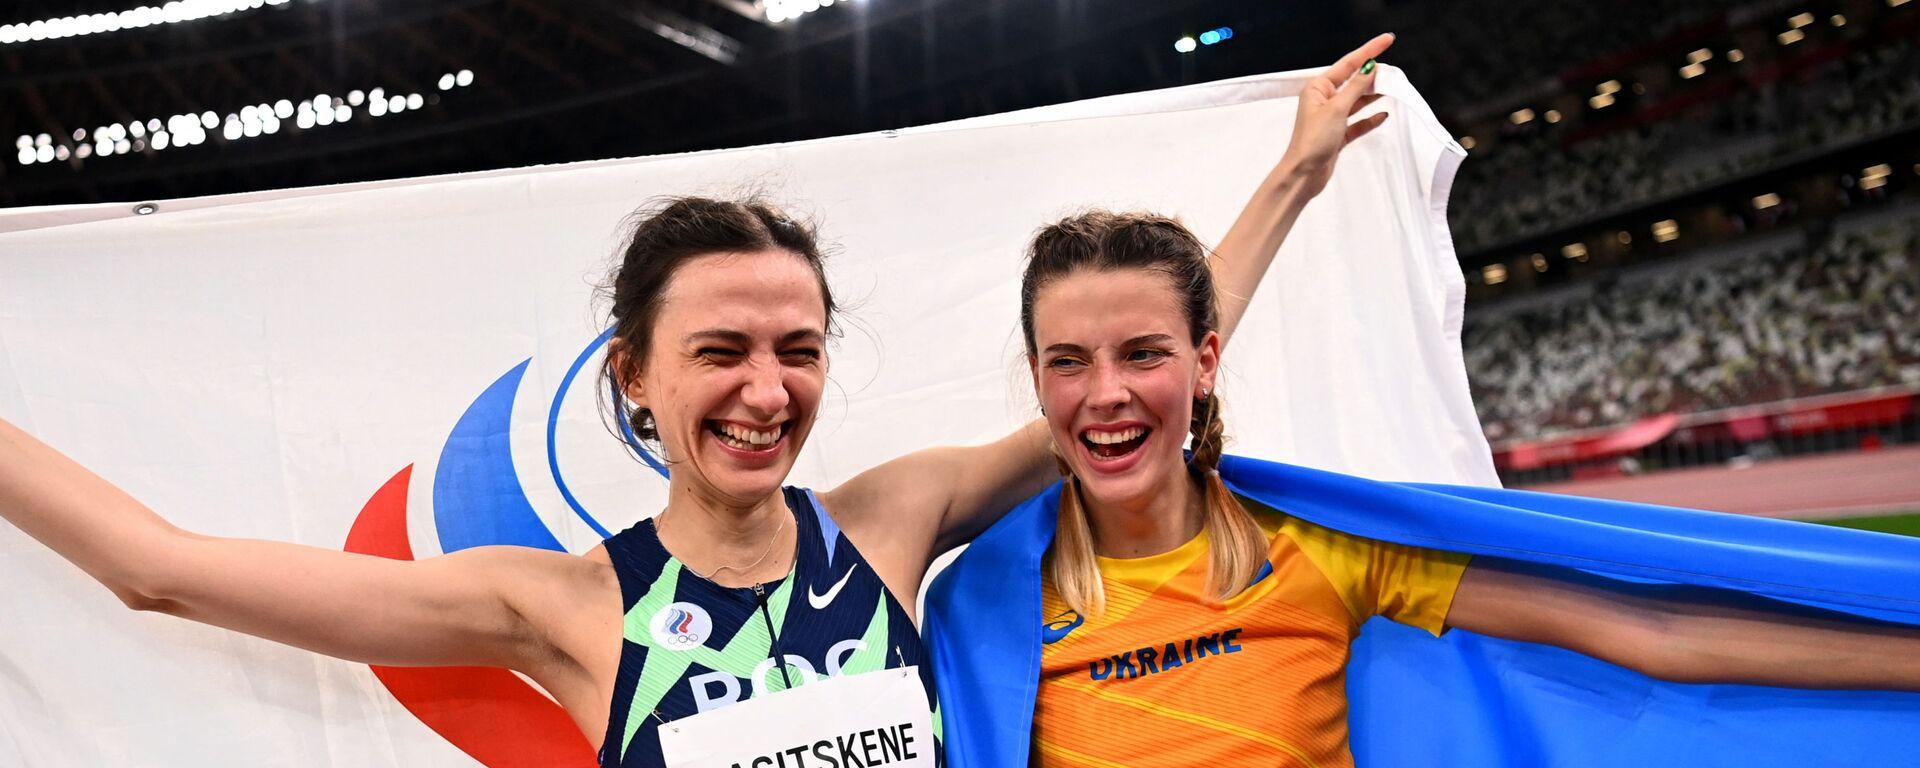 Yaroslava Mahuchikh e Maria Lasitskene - Sputnik Italia, 1920, 09.08.2021